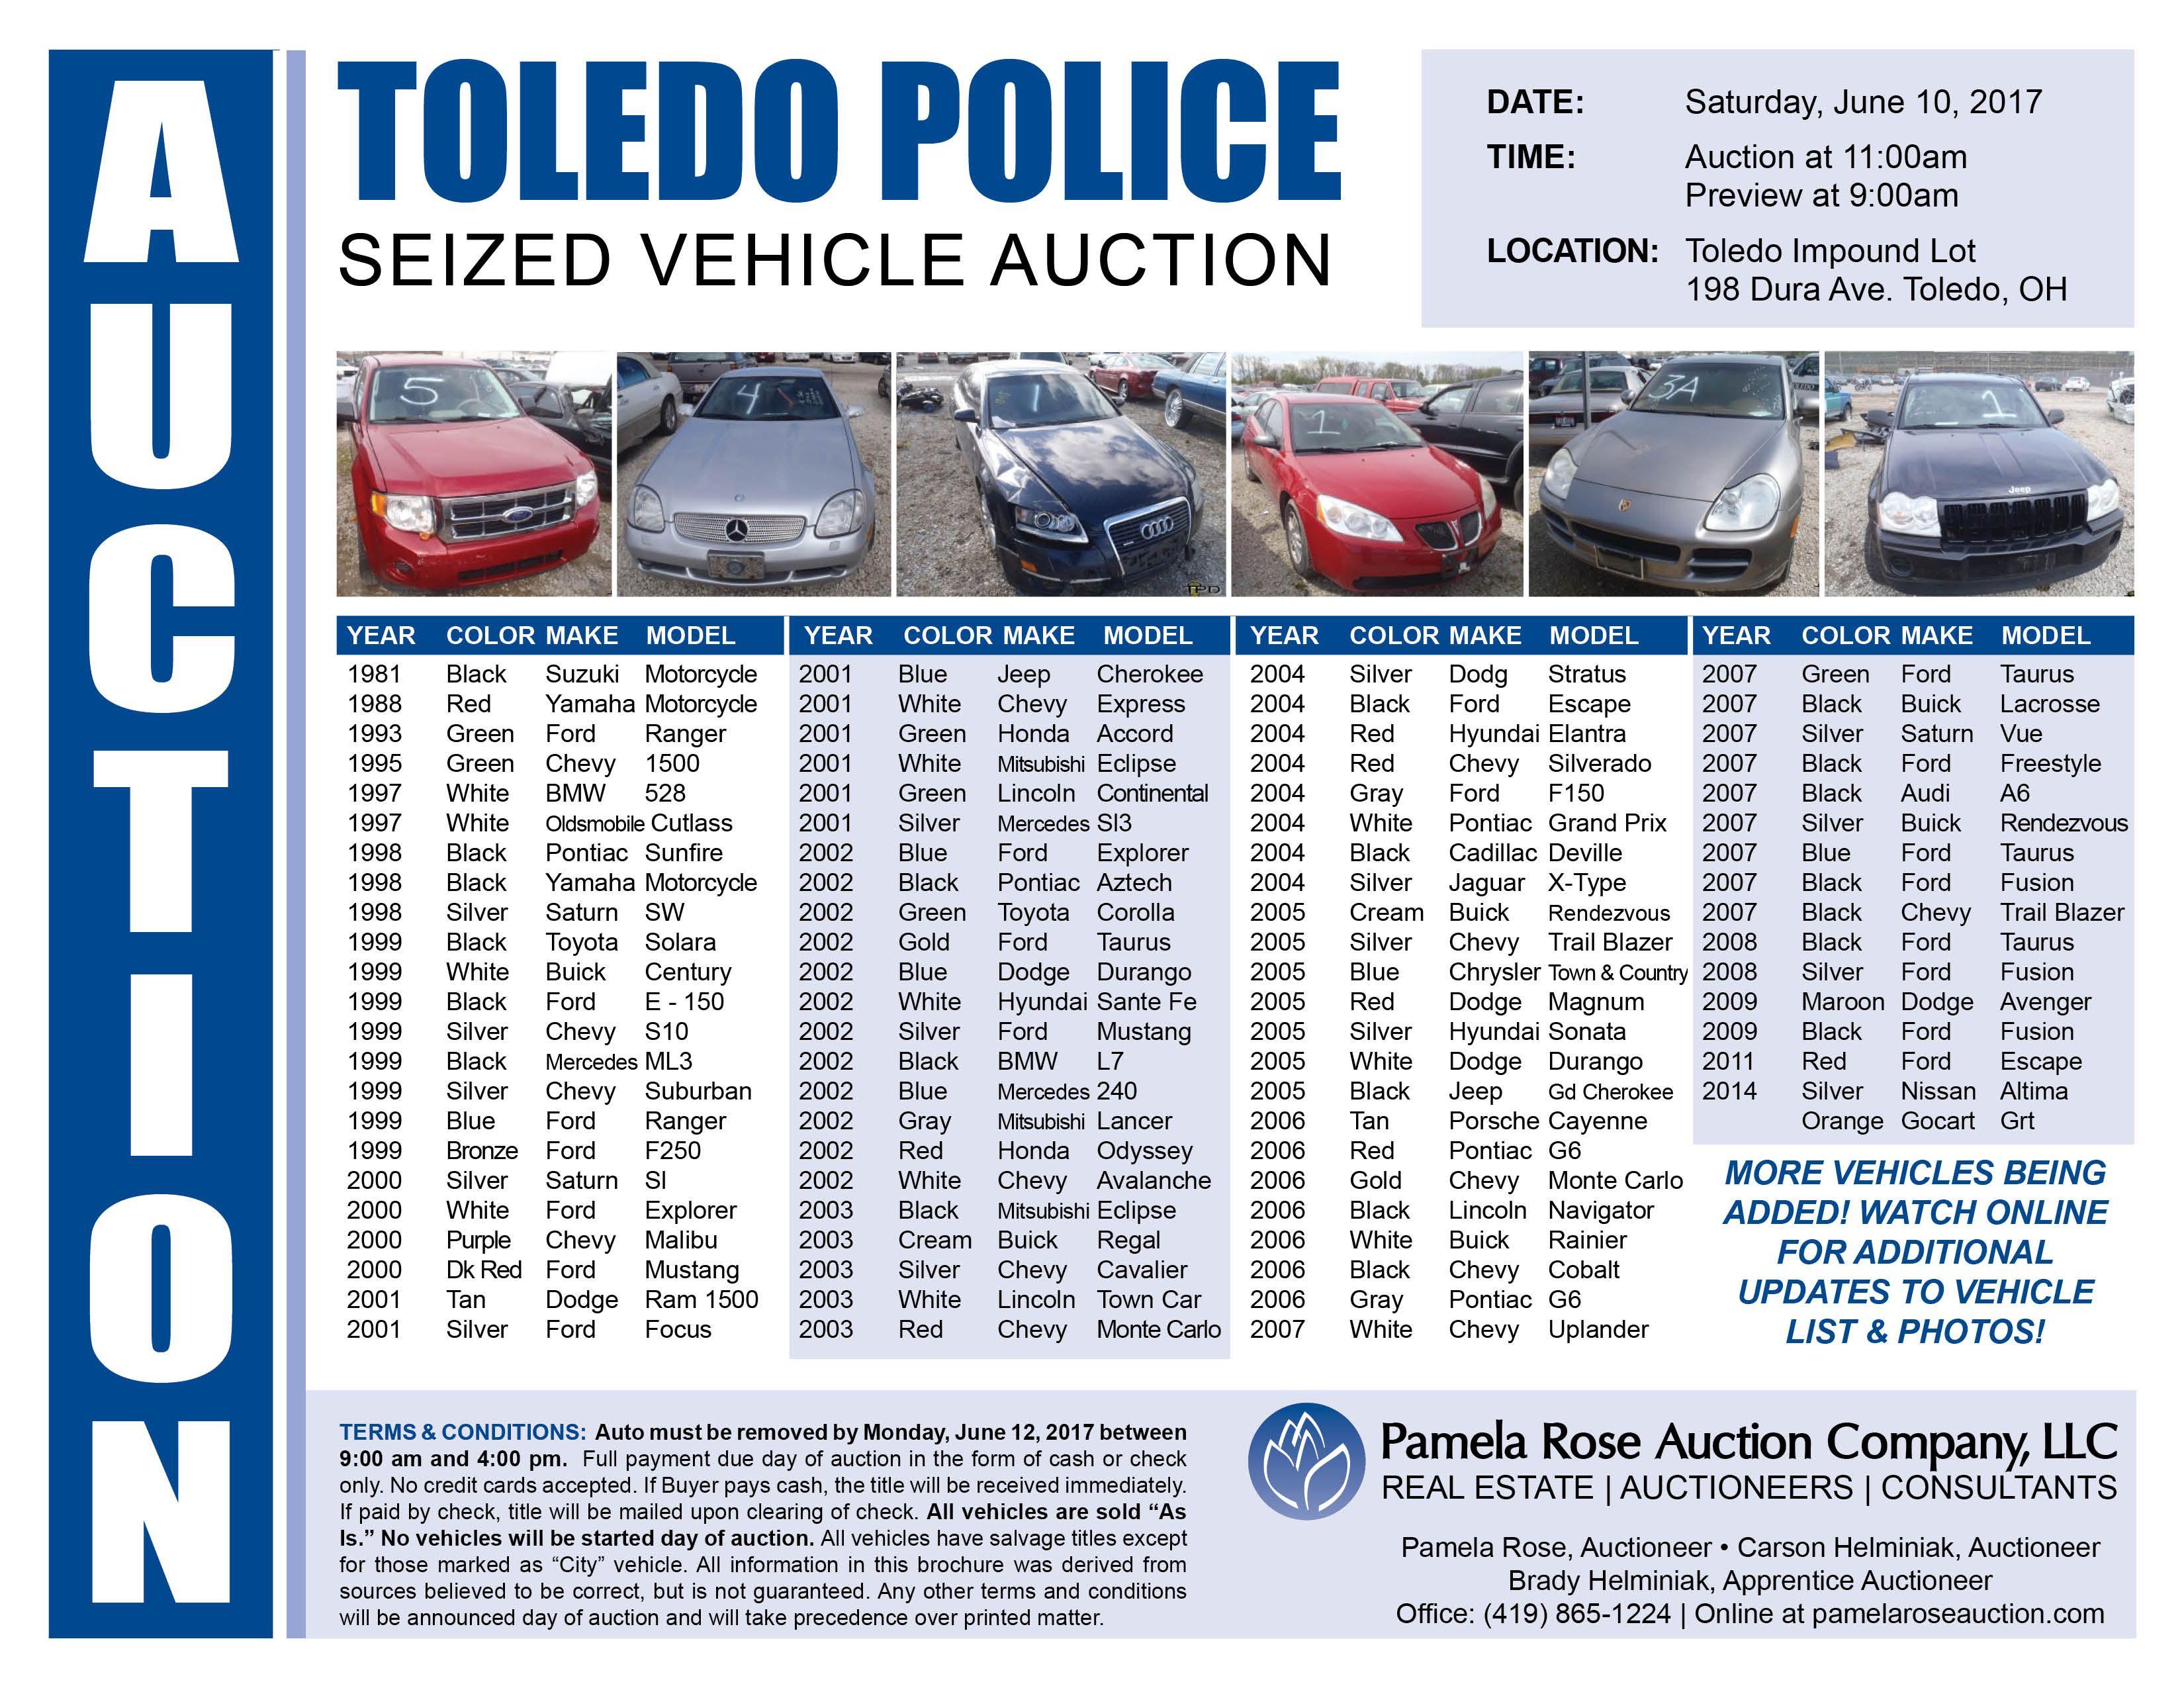 Police Impound Auction >> Toledo Police Seized Vehicle Auction 80 Vehicles Selling